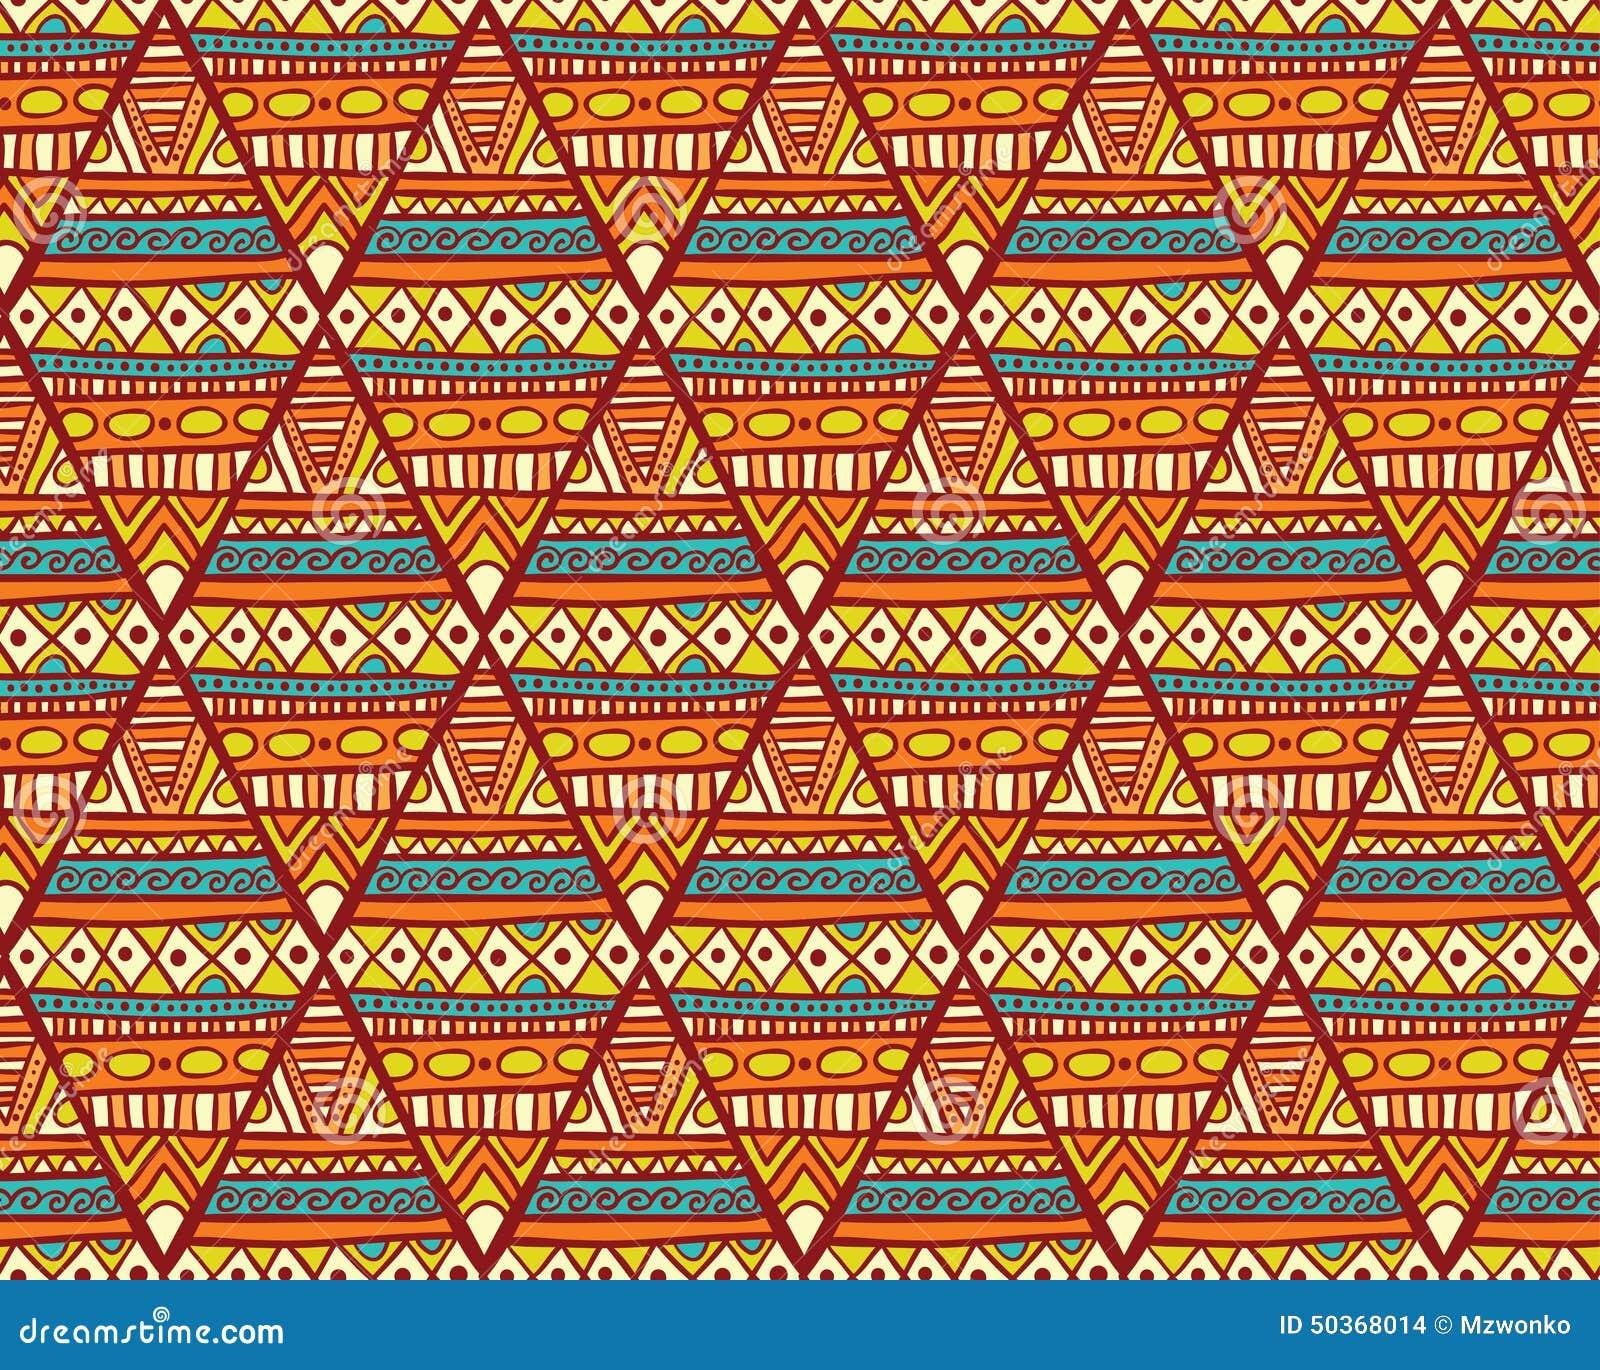 Ethno Muster nahtloses romb ethno muster vektor abbildung - illustration von